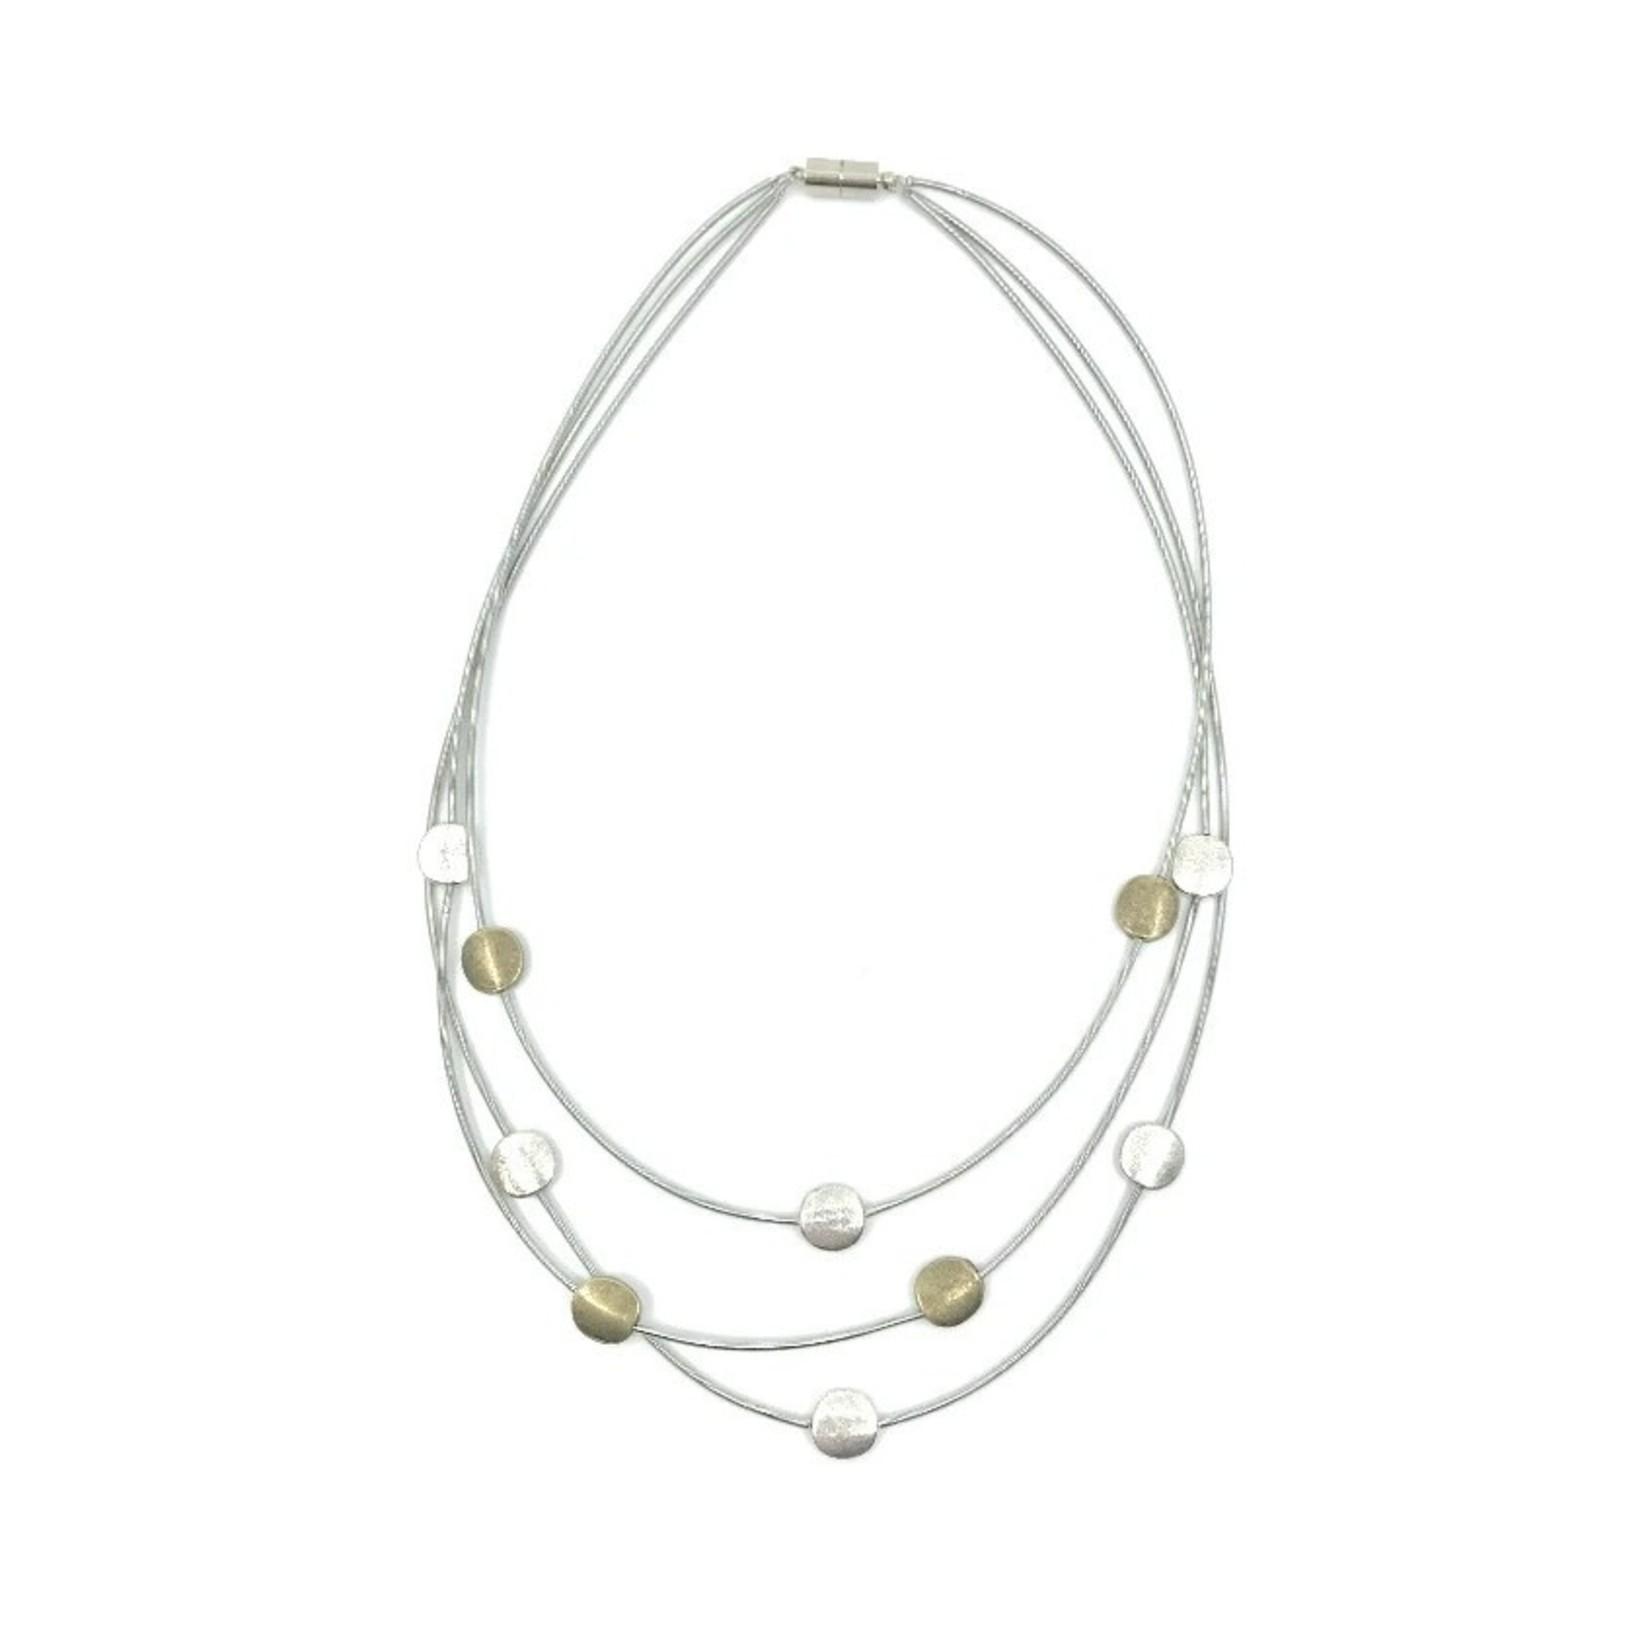 Sea Lily Silver PW 3 Strand Necklace w/ Gold/Slvr Discs